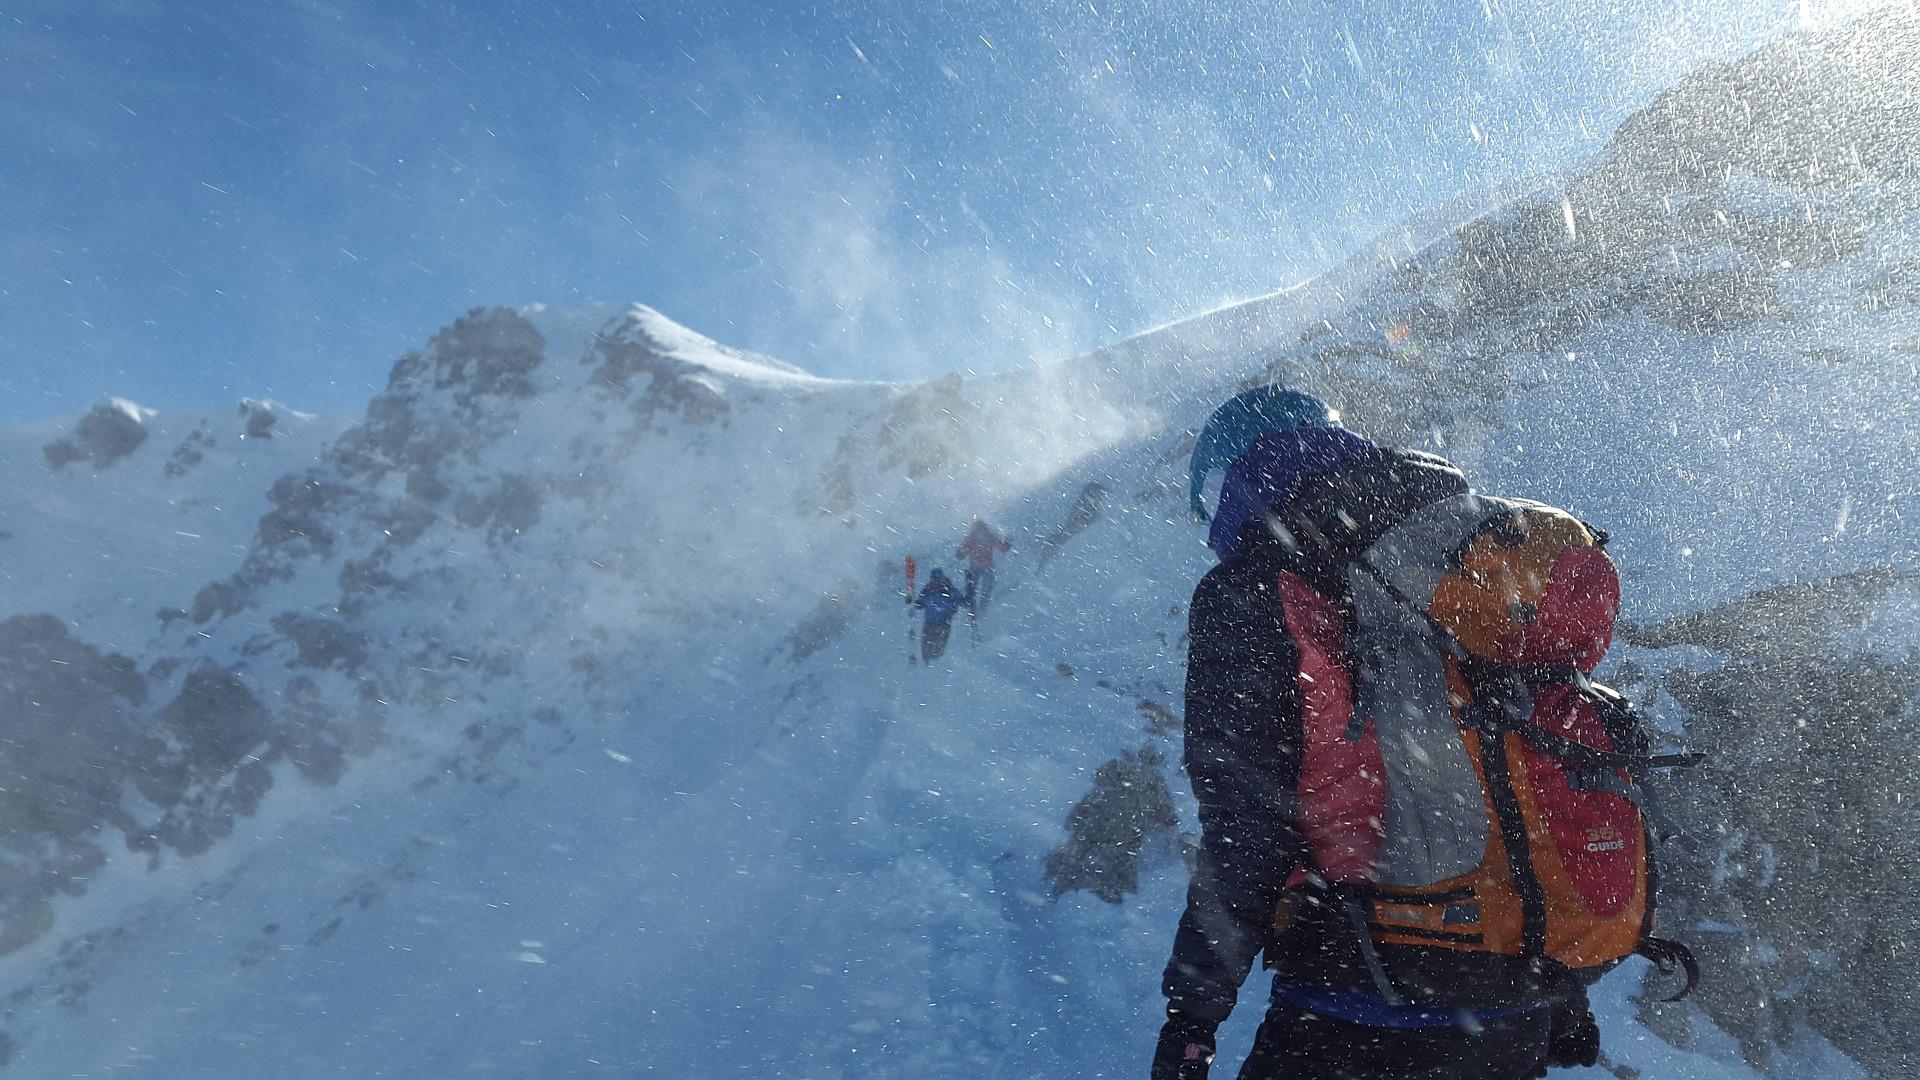 Would you climb a mountain without training?